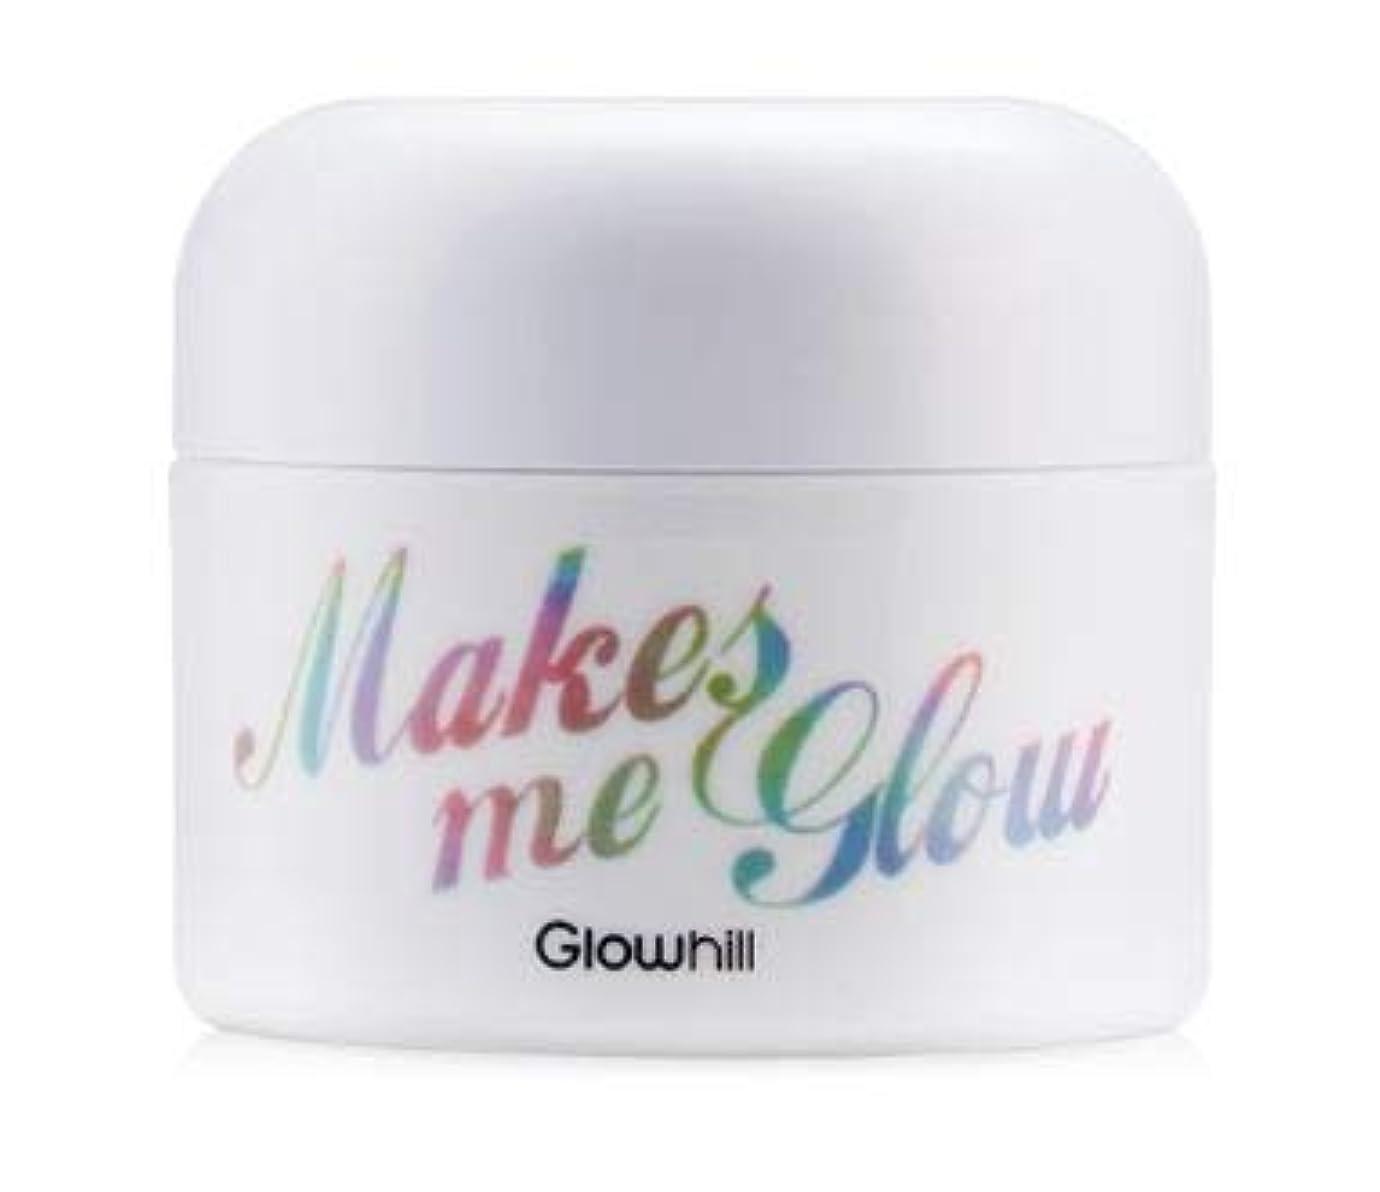 [Glowhill] Aurora Whitehole Glow Mask / [グローヒル] オーロラホワイトホールグローマスク [並行輸入品]